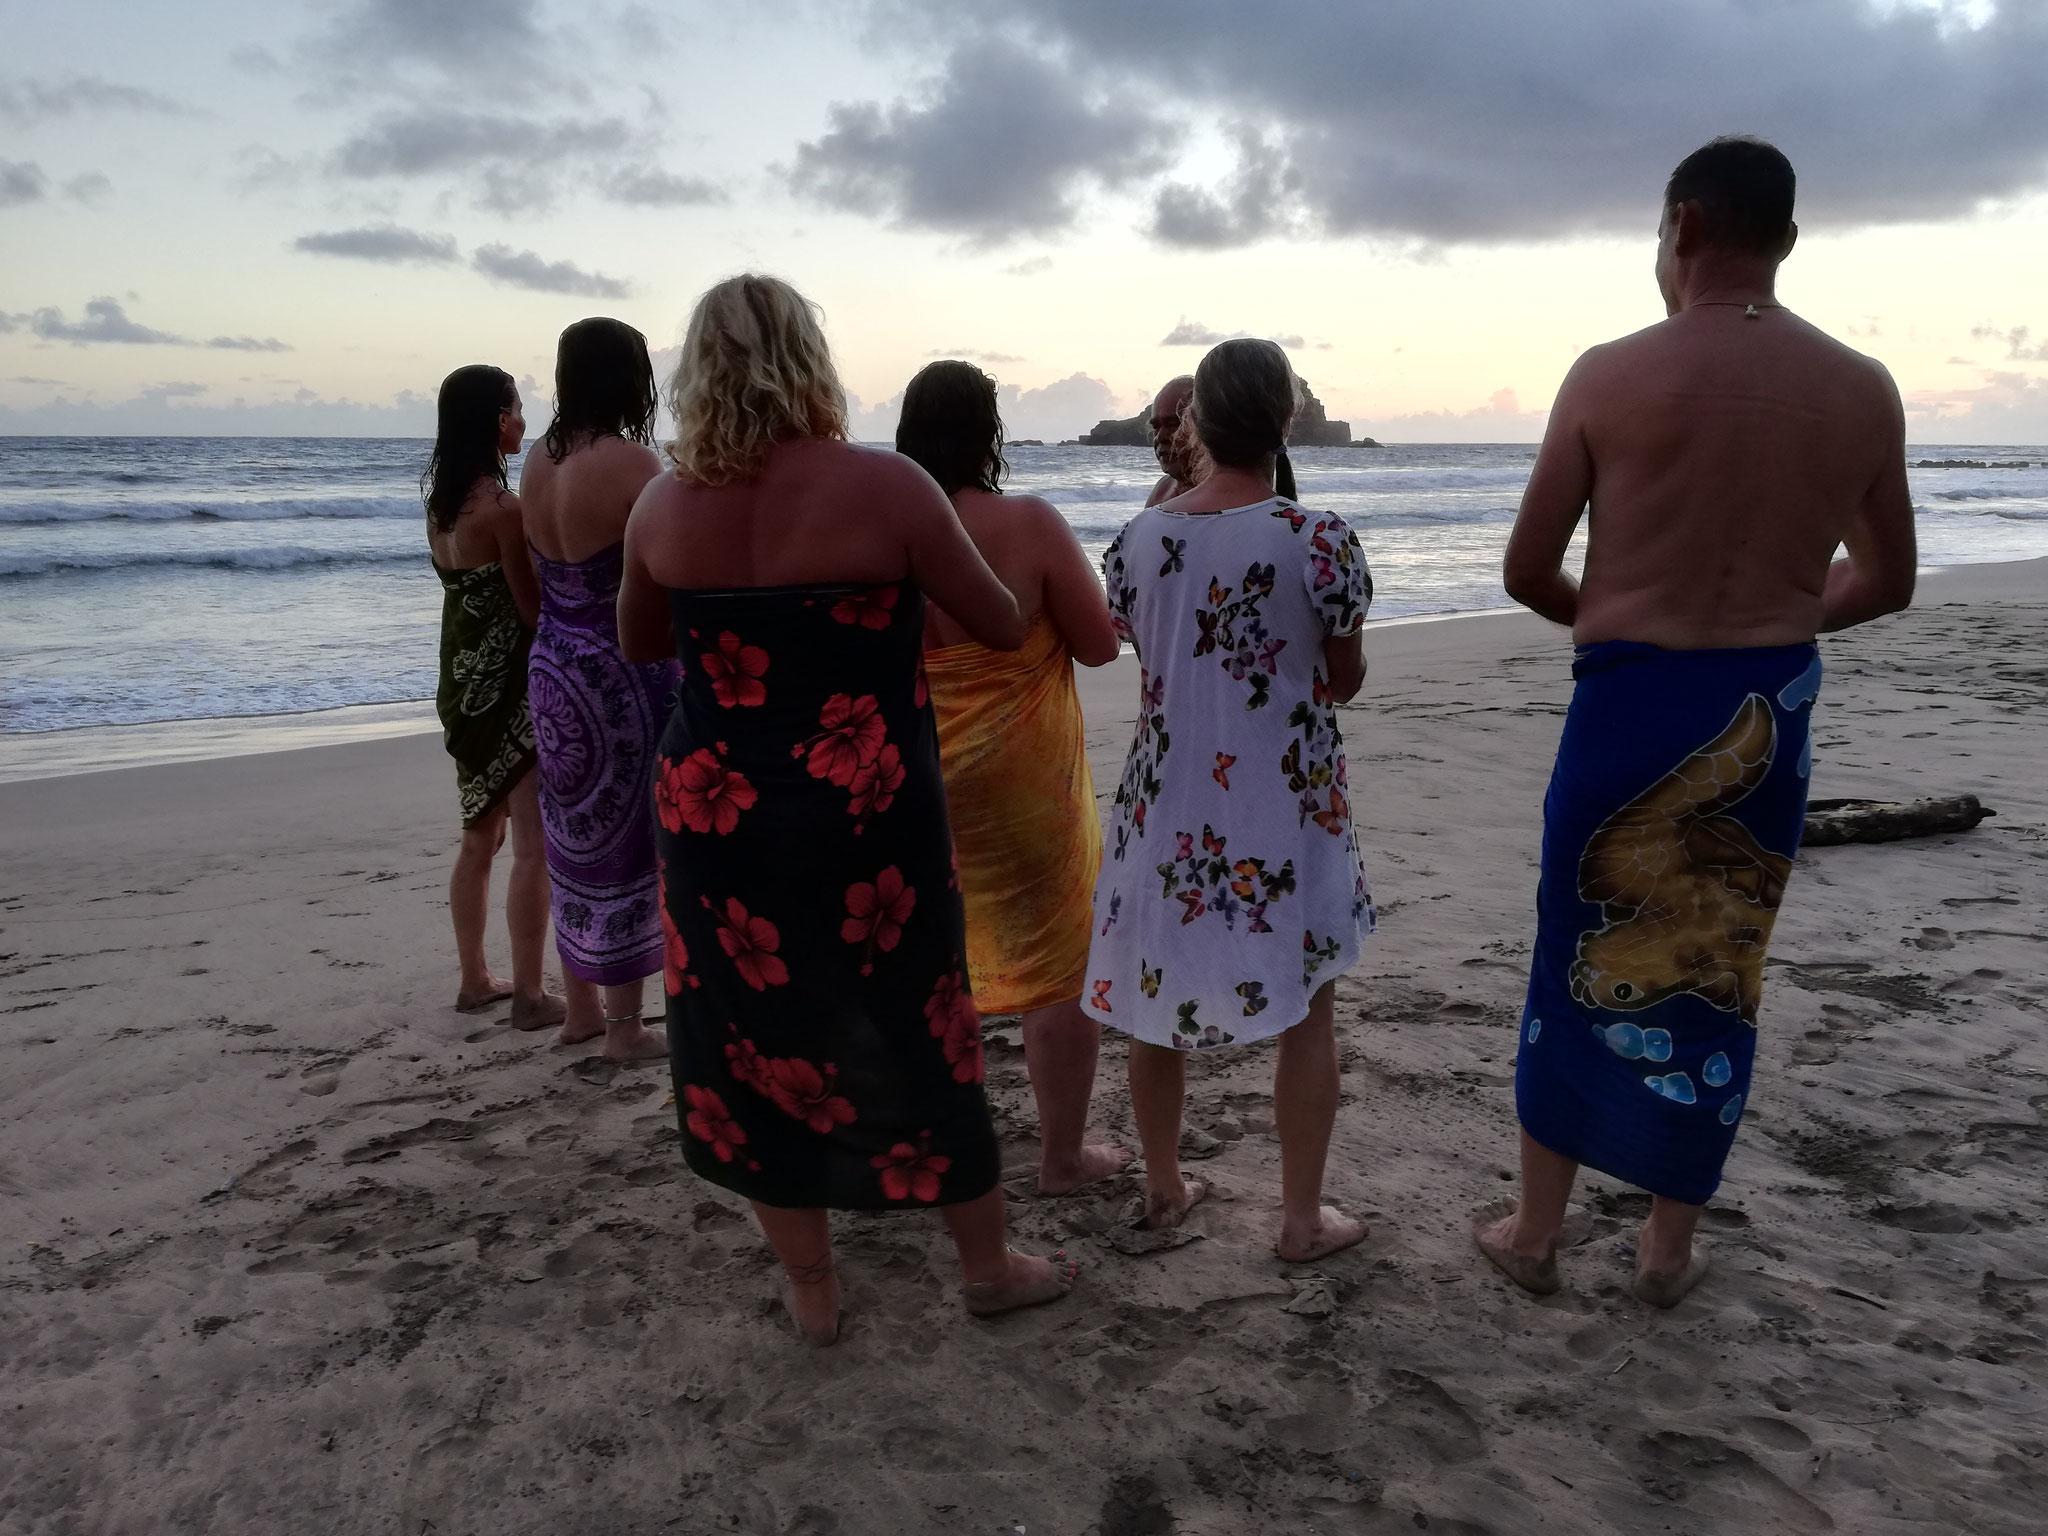 alte Zeremonien beim Retreat - Reise zu dir Selbst - Maui, Hawaii - Academy of Aloha